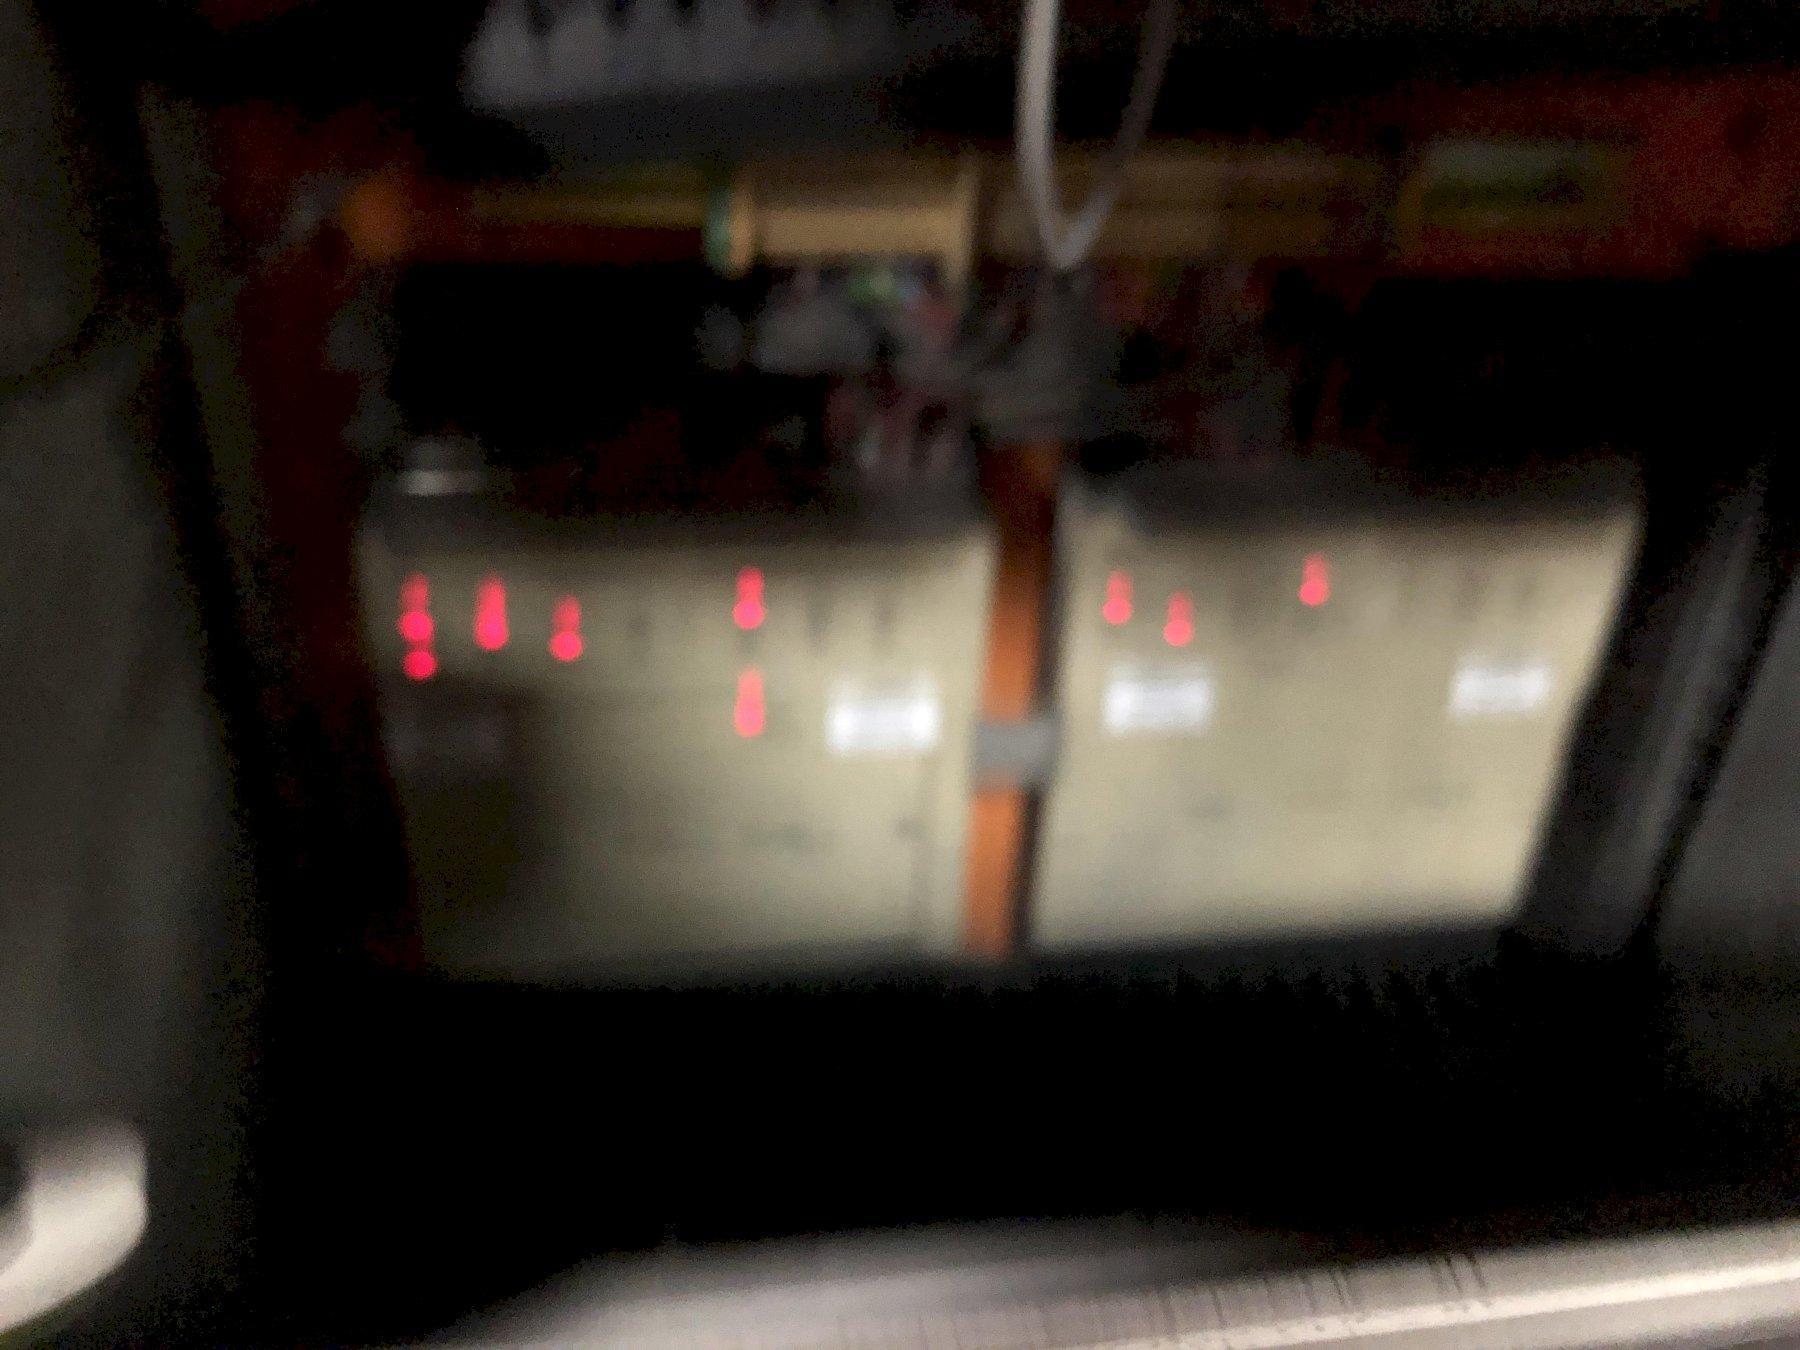 BMM MODEL QJS 222 MOLDING MACHINE WITH CONTROLS S/N DH11259